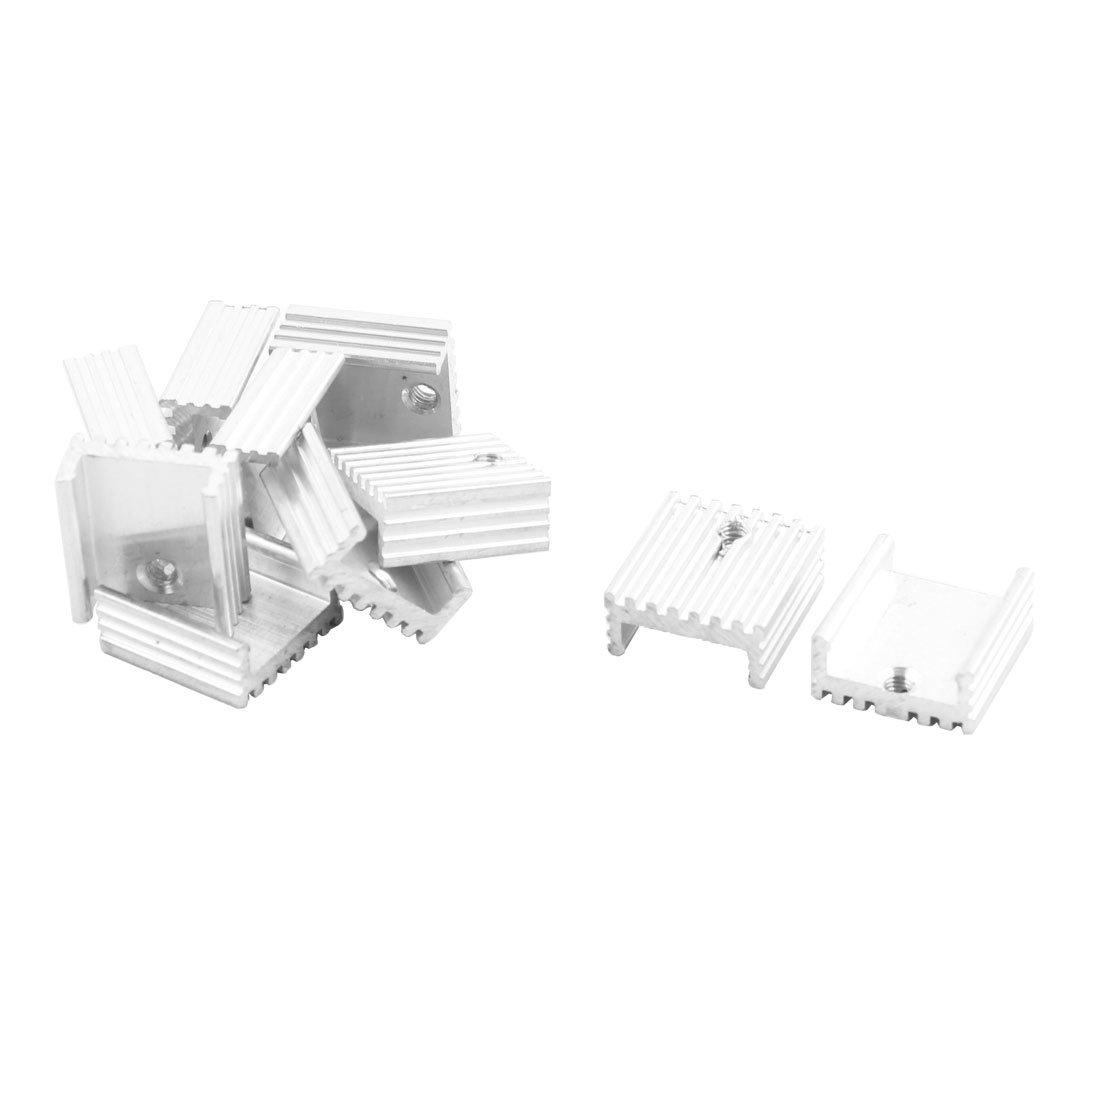 uxcell 10 Pcs 15mm x 15mm x 6mm Aluminum Heatsink for IC MOSFET SCR Component a13101700ux0227